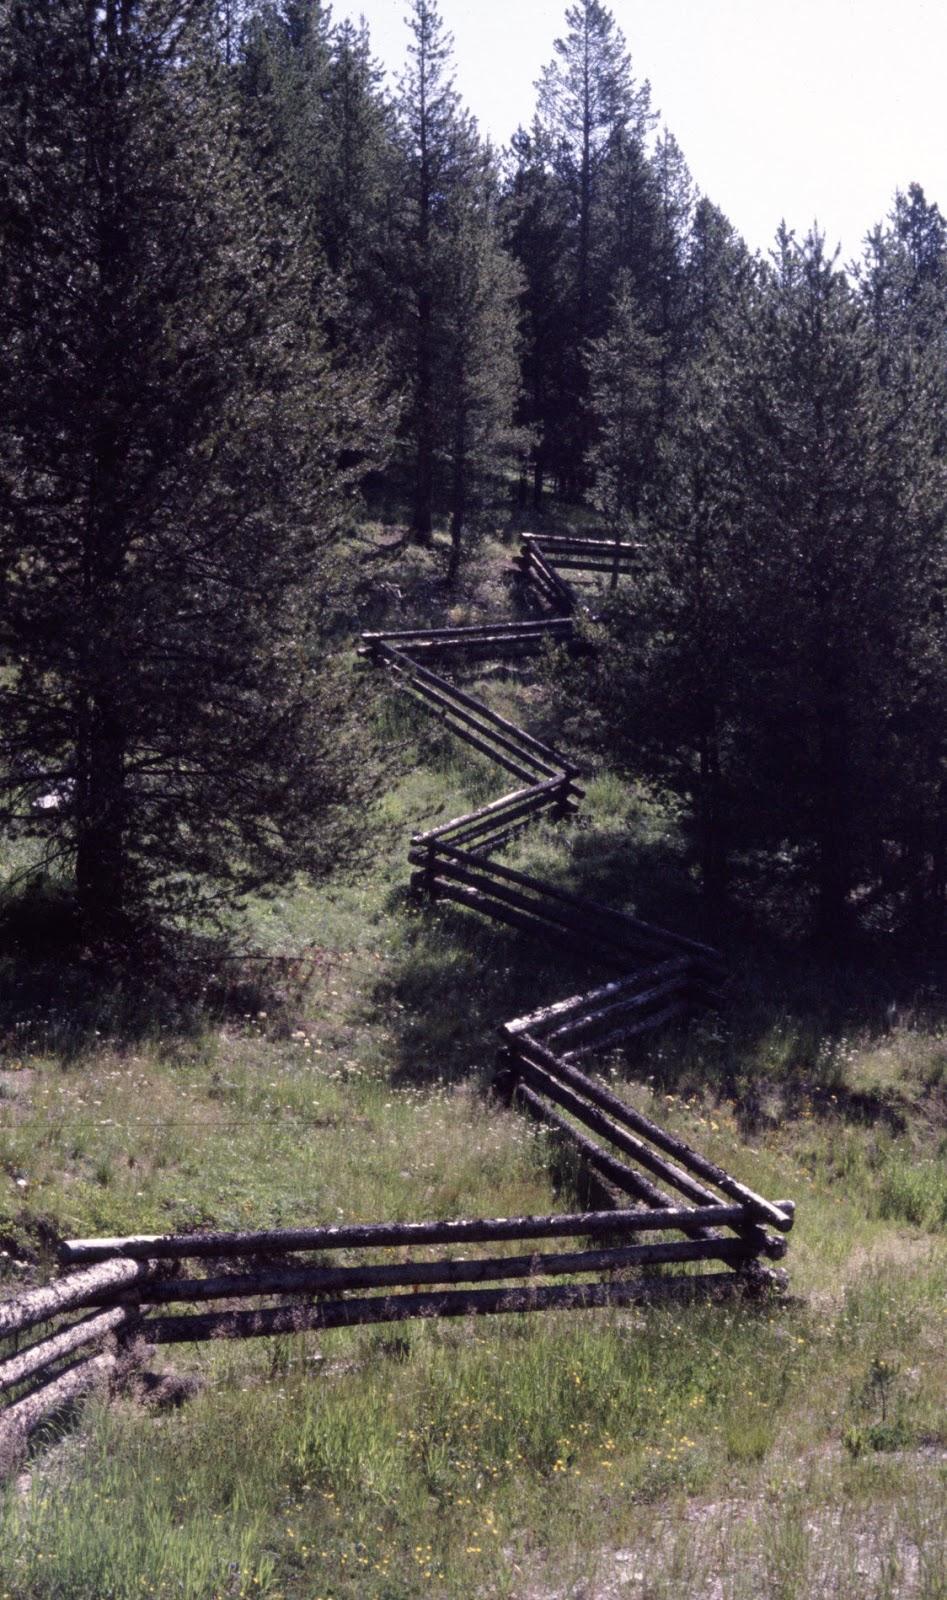 Zigzag rail fence